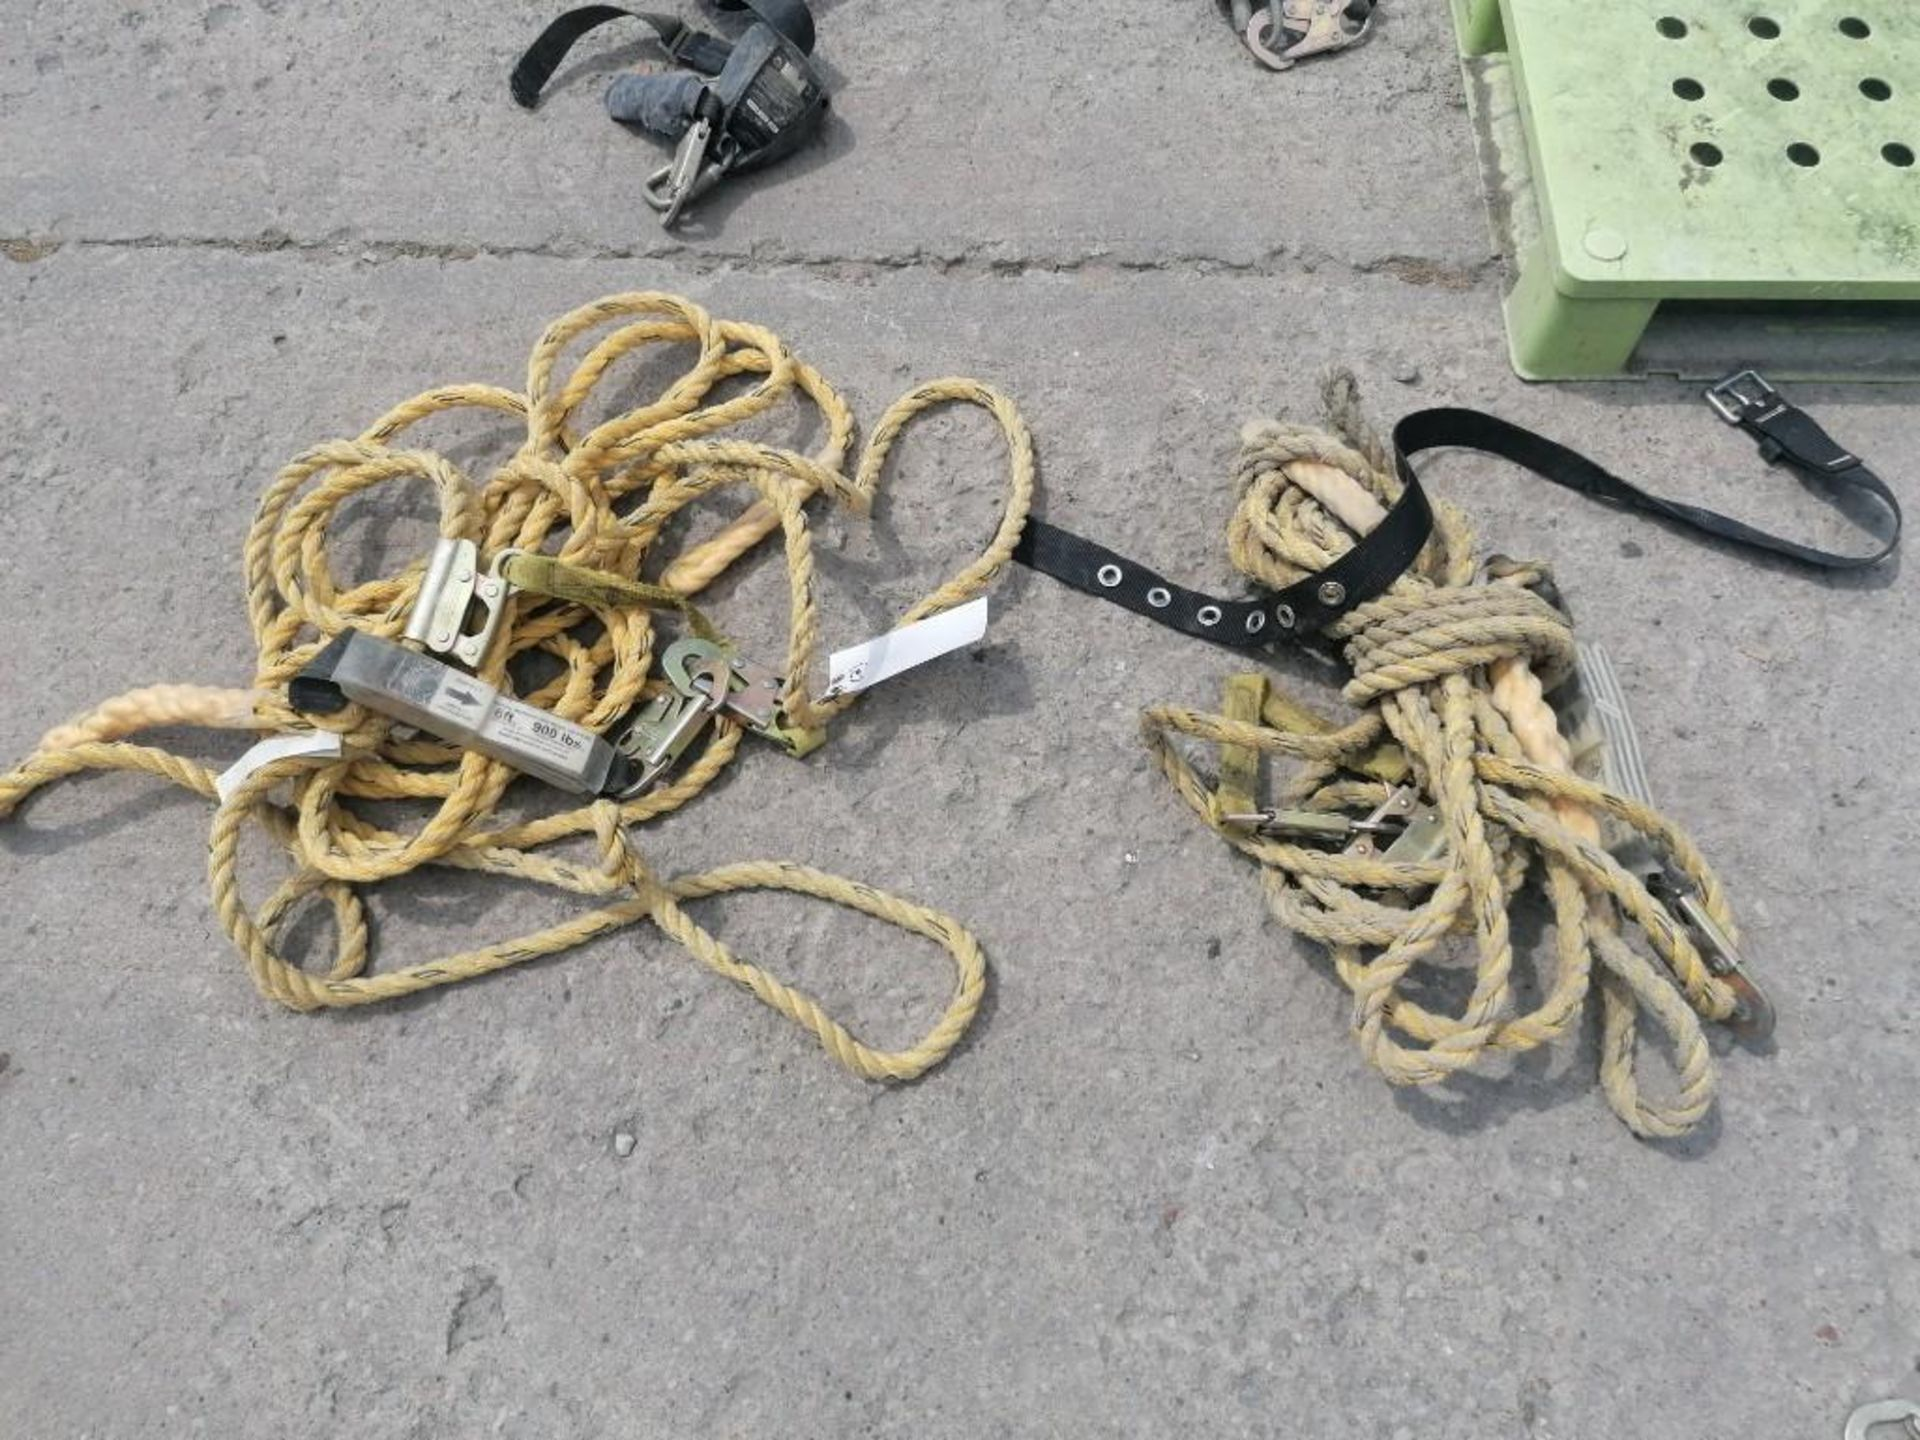 Lot 930 - (2) Climbing Ropes